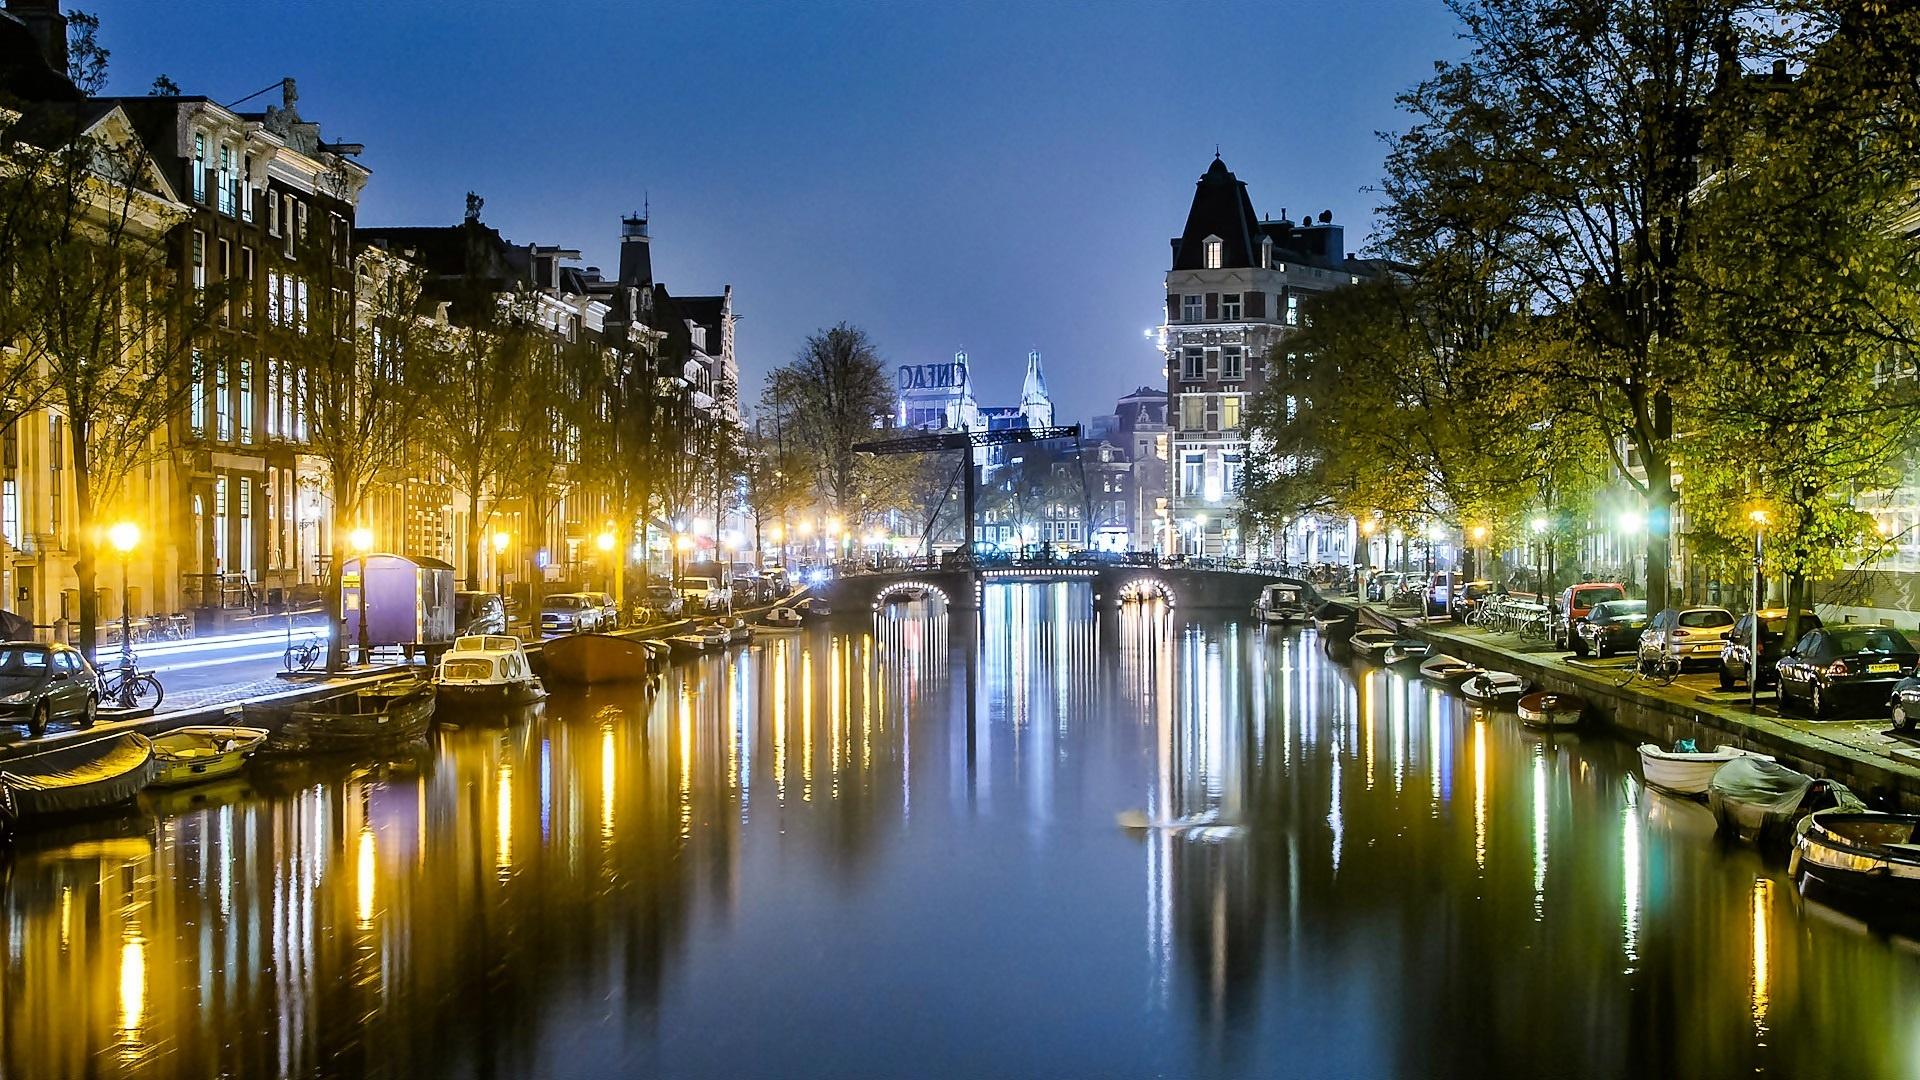 Amsterdam Noc Kamienice Kana Most Dki